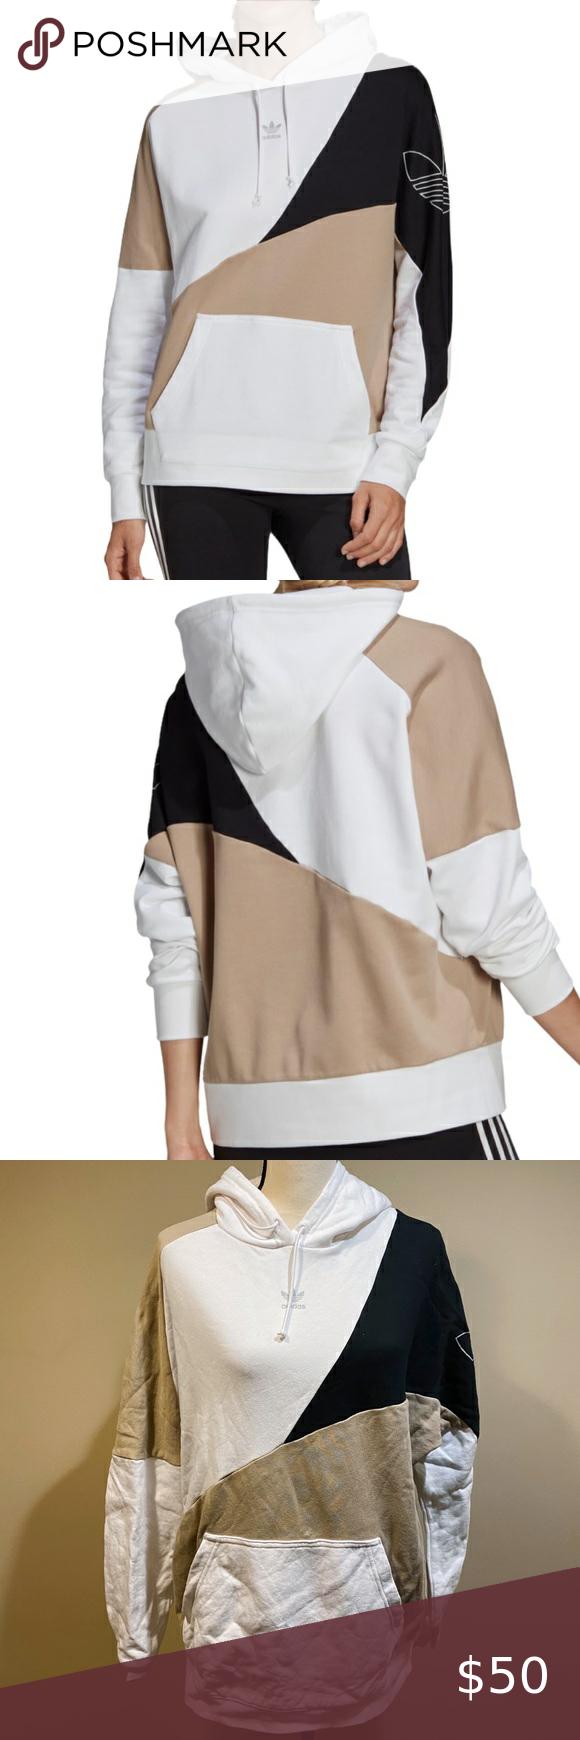 Adidas Originals Colorblock Hoodie Sweatshirt Clothes Design Sweatshirts Hoodie Fashion [ 1740 x 580 Pixel ]